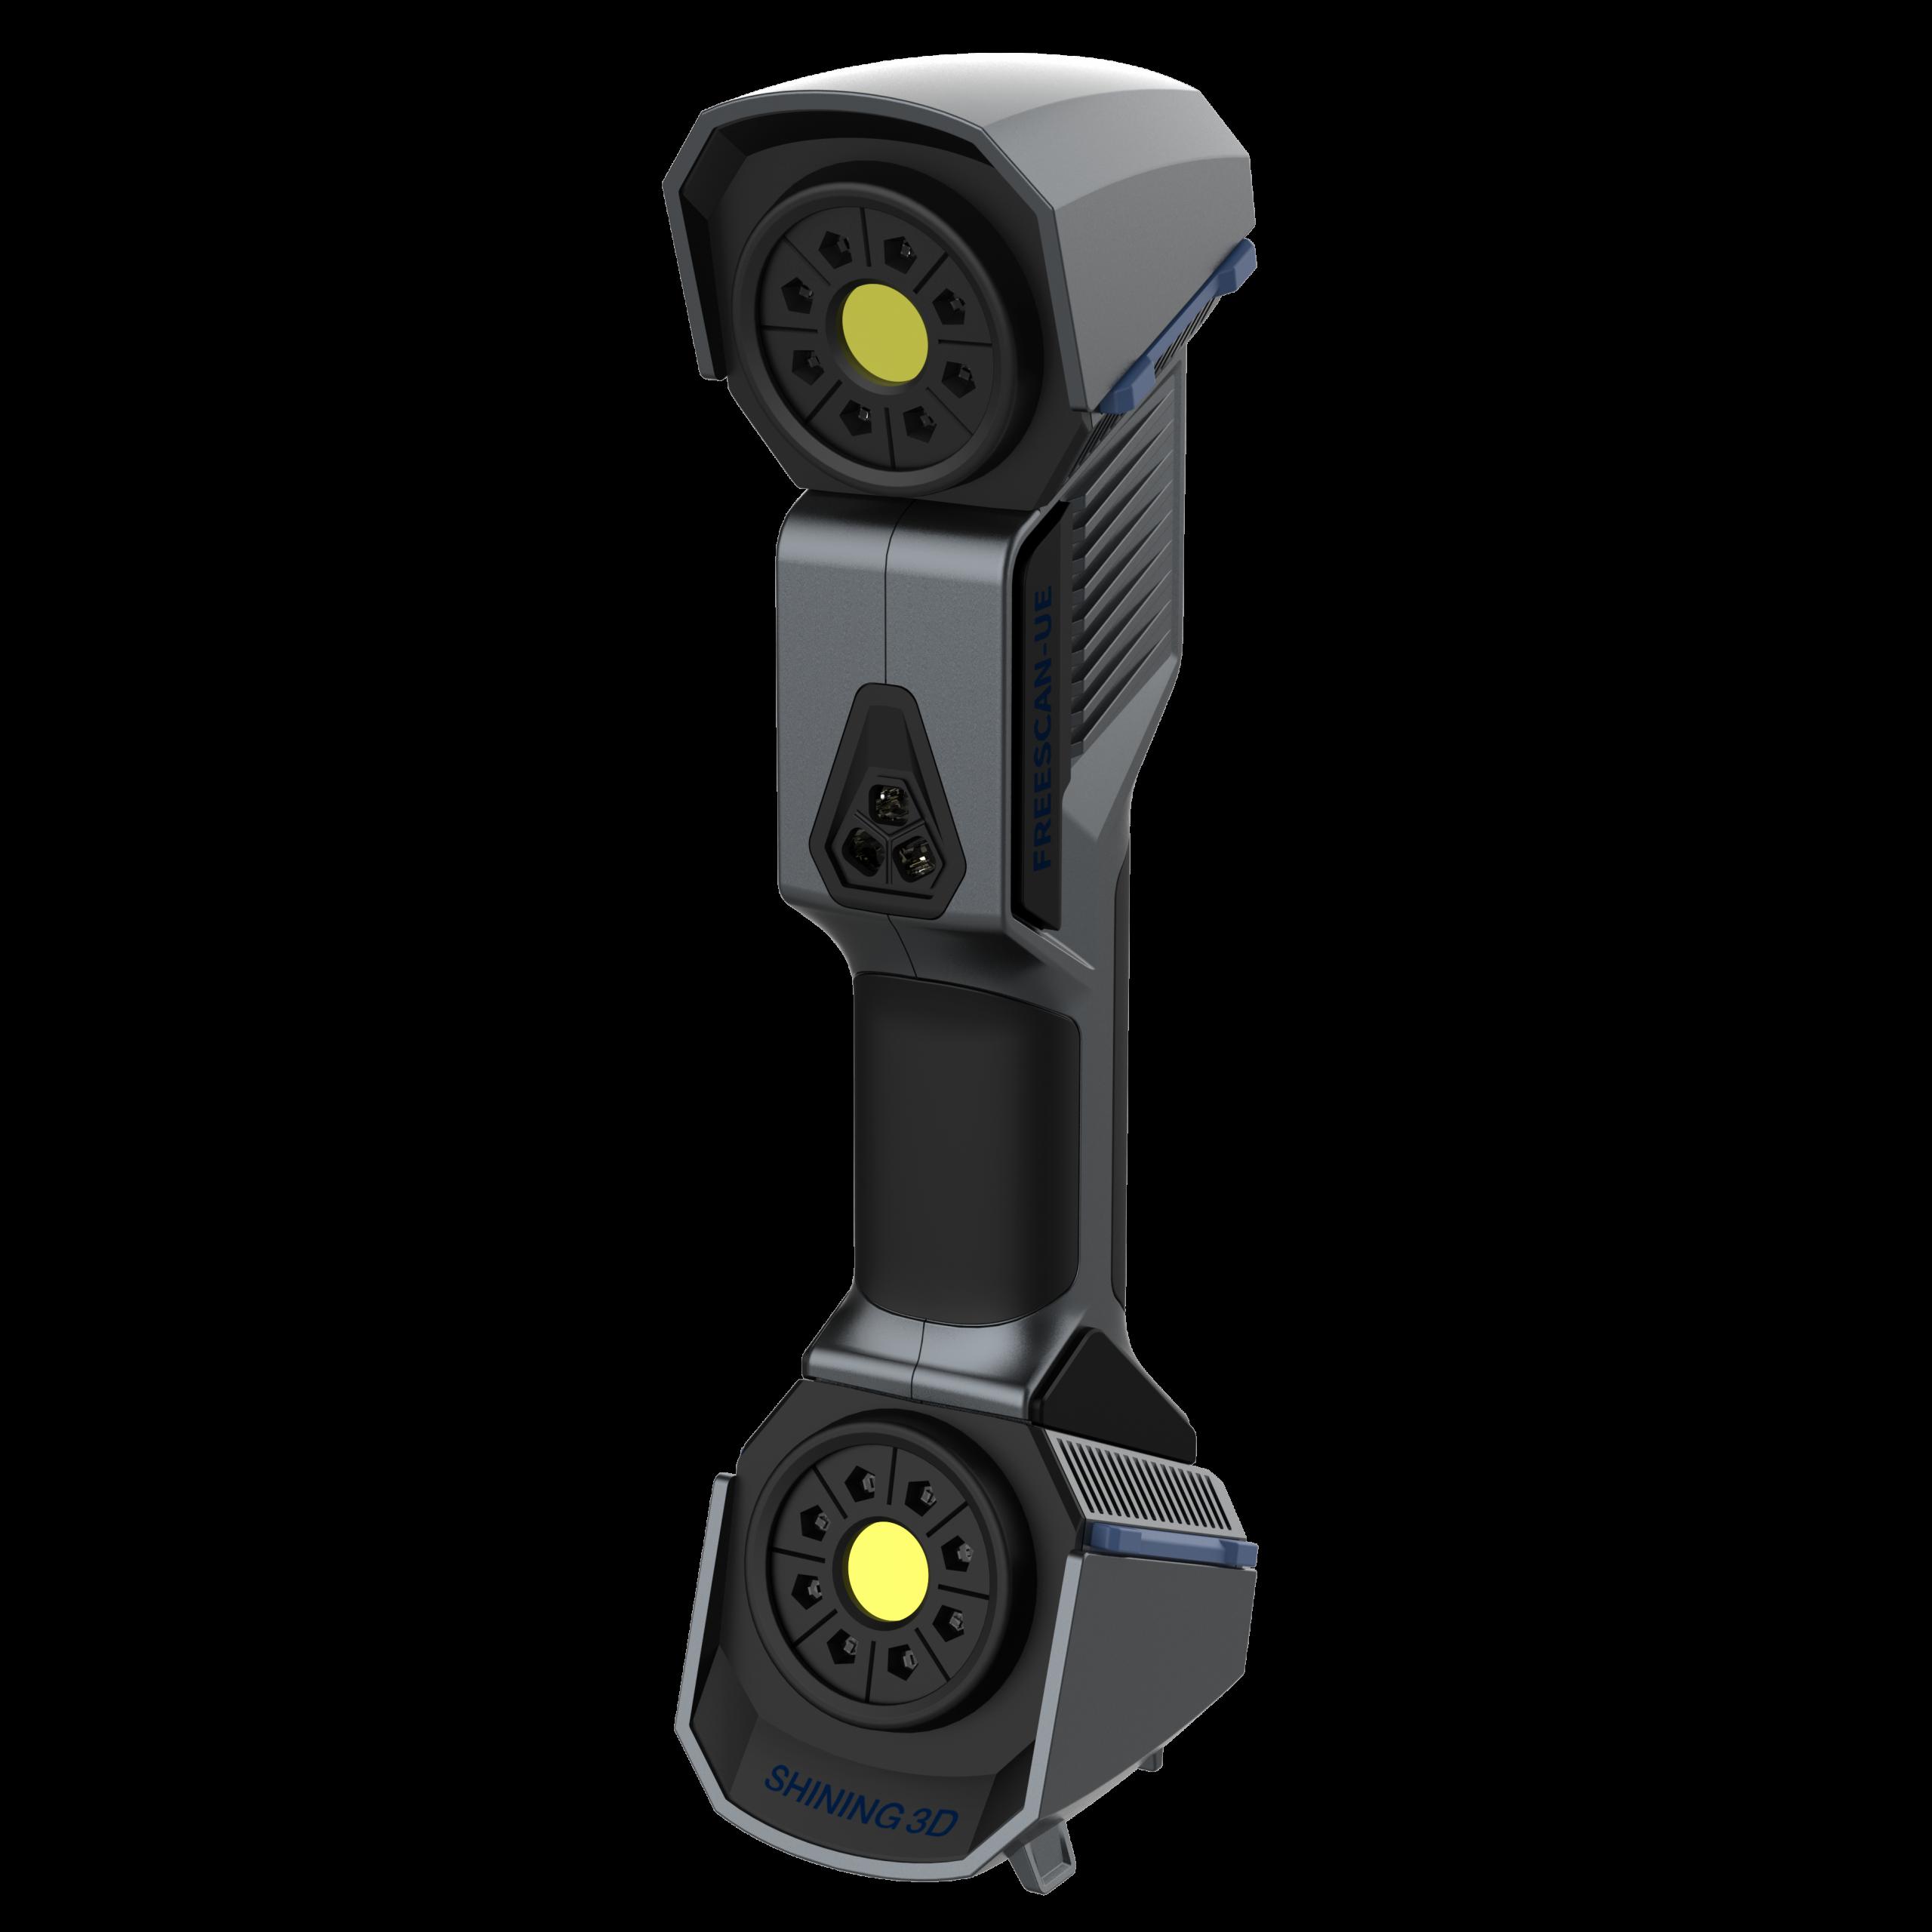 FreeScan UE Shining 3D - Scanners 3D